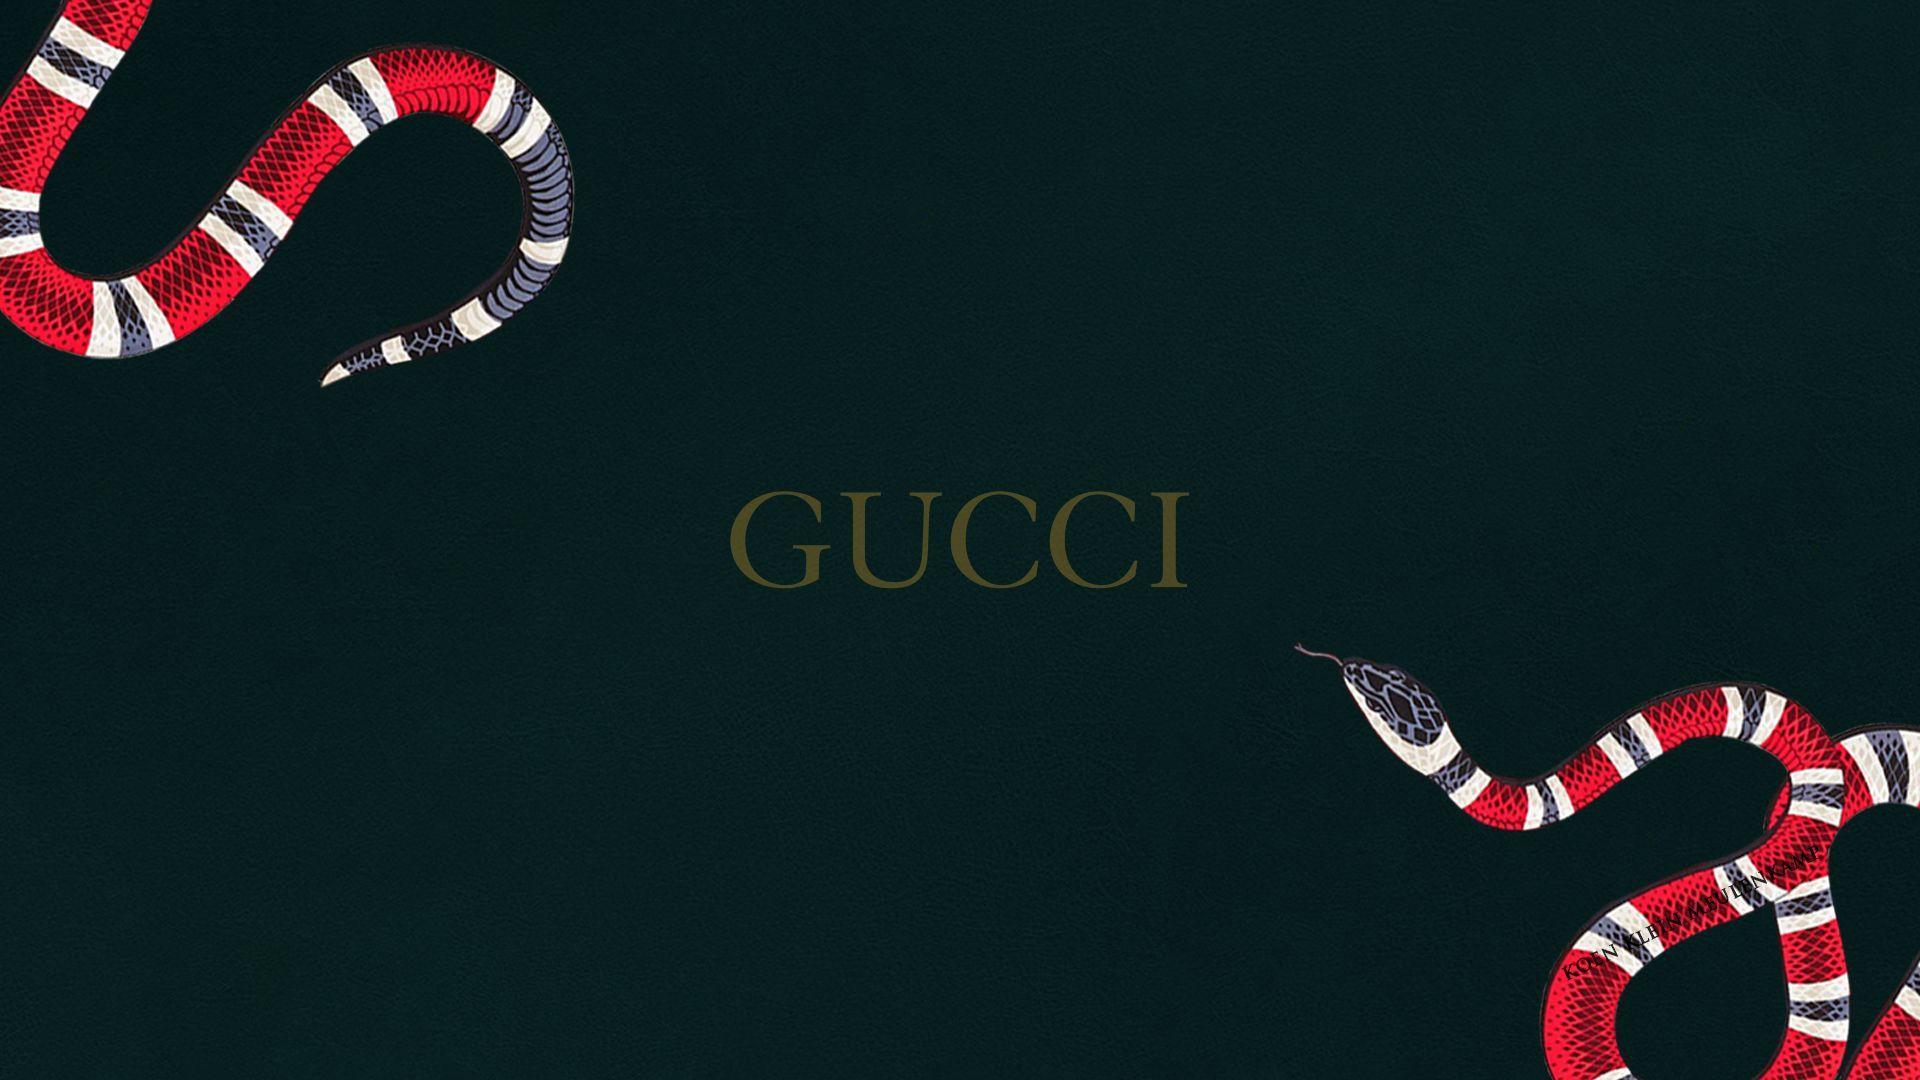 A Quality Gucci Wallpaper